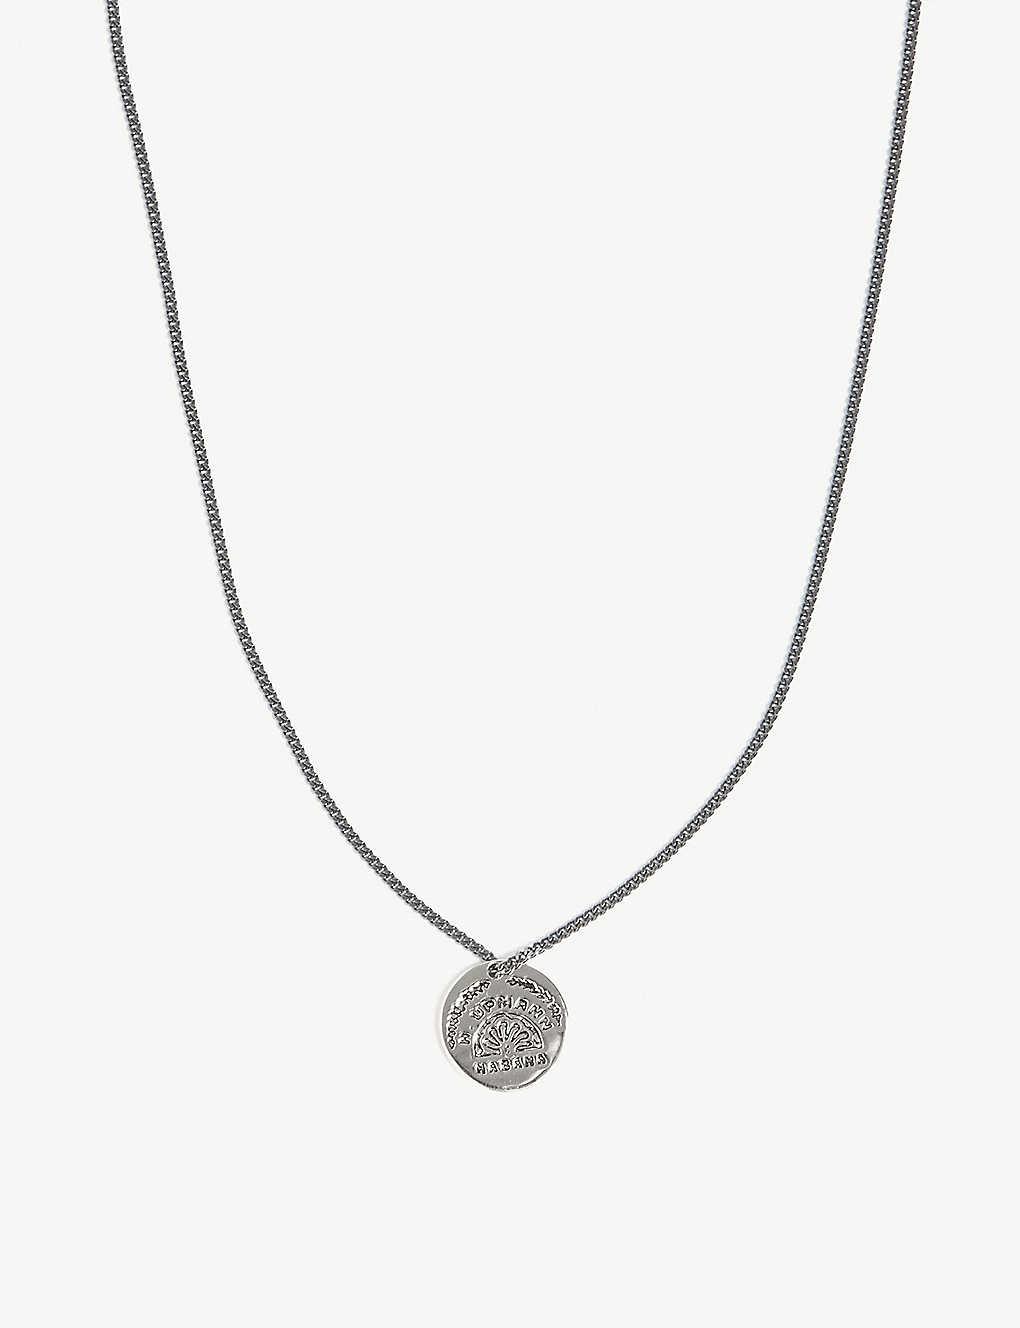 Miansai Viñales pendant sterling-silver necklace yWjK62aa